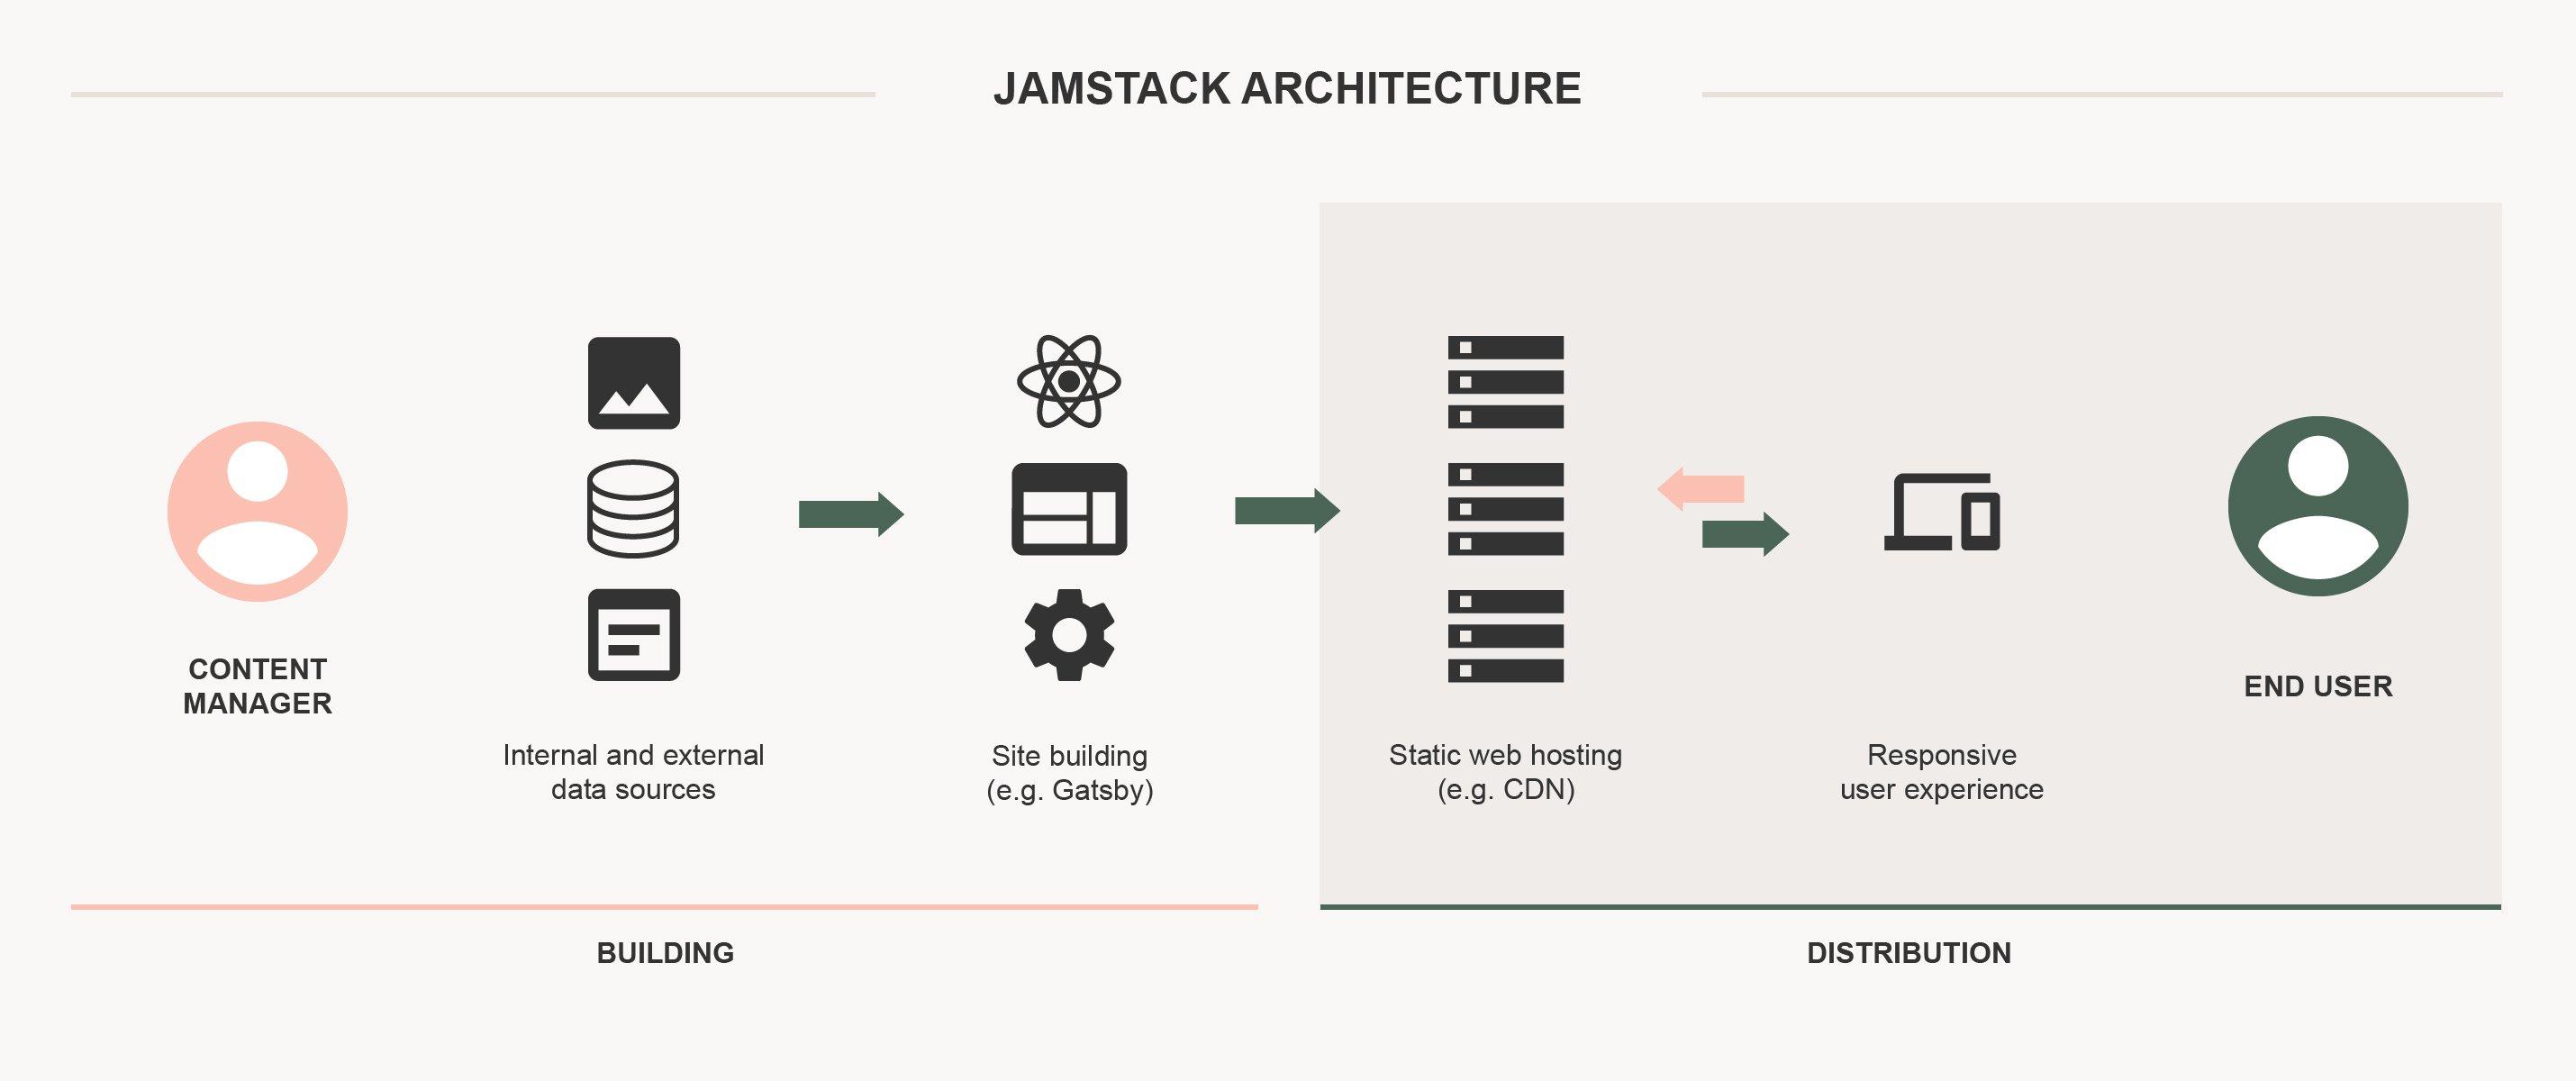 architecture-jamstack@2x